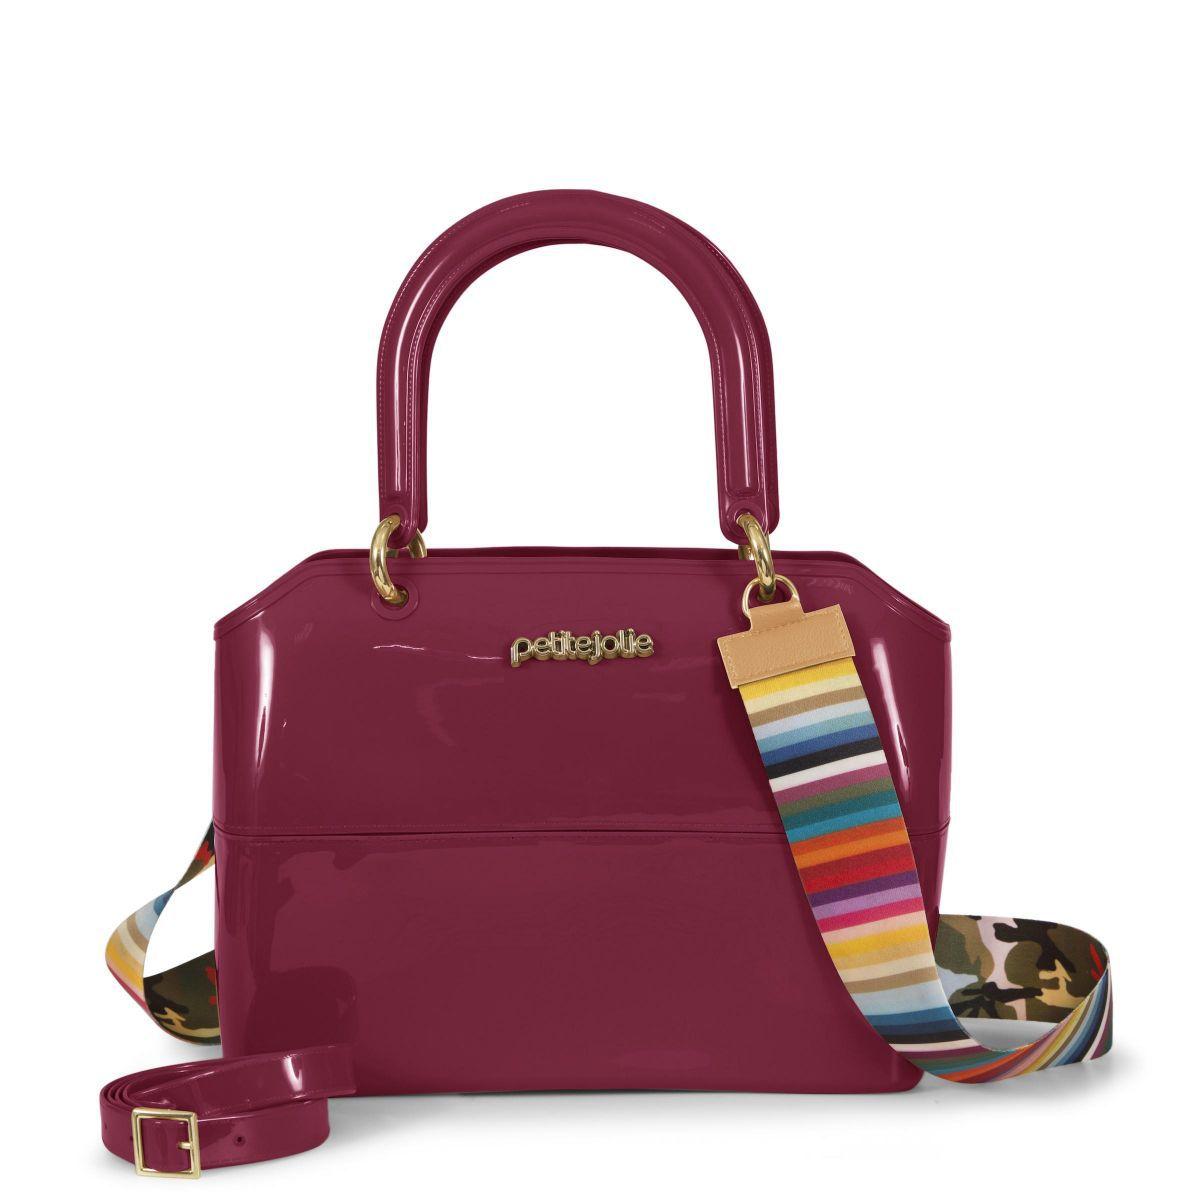 Bolsa Média Petite Jolie Zip Bag Pj3177 Bordô